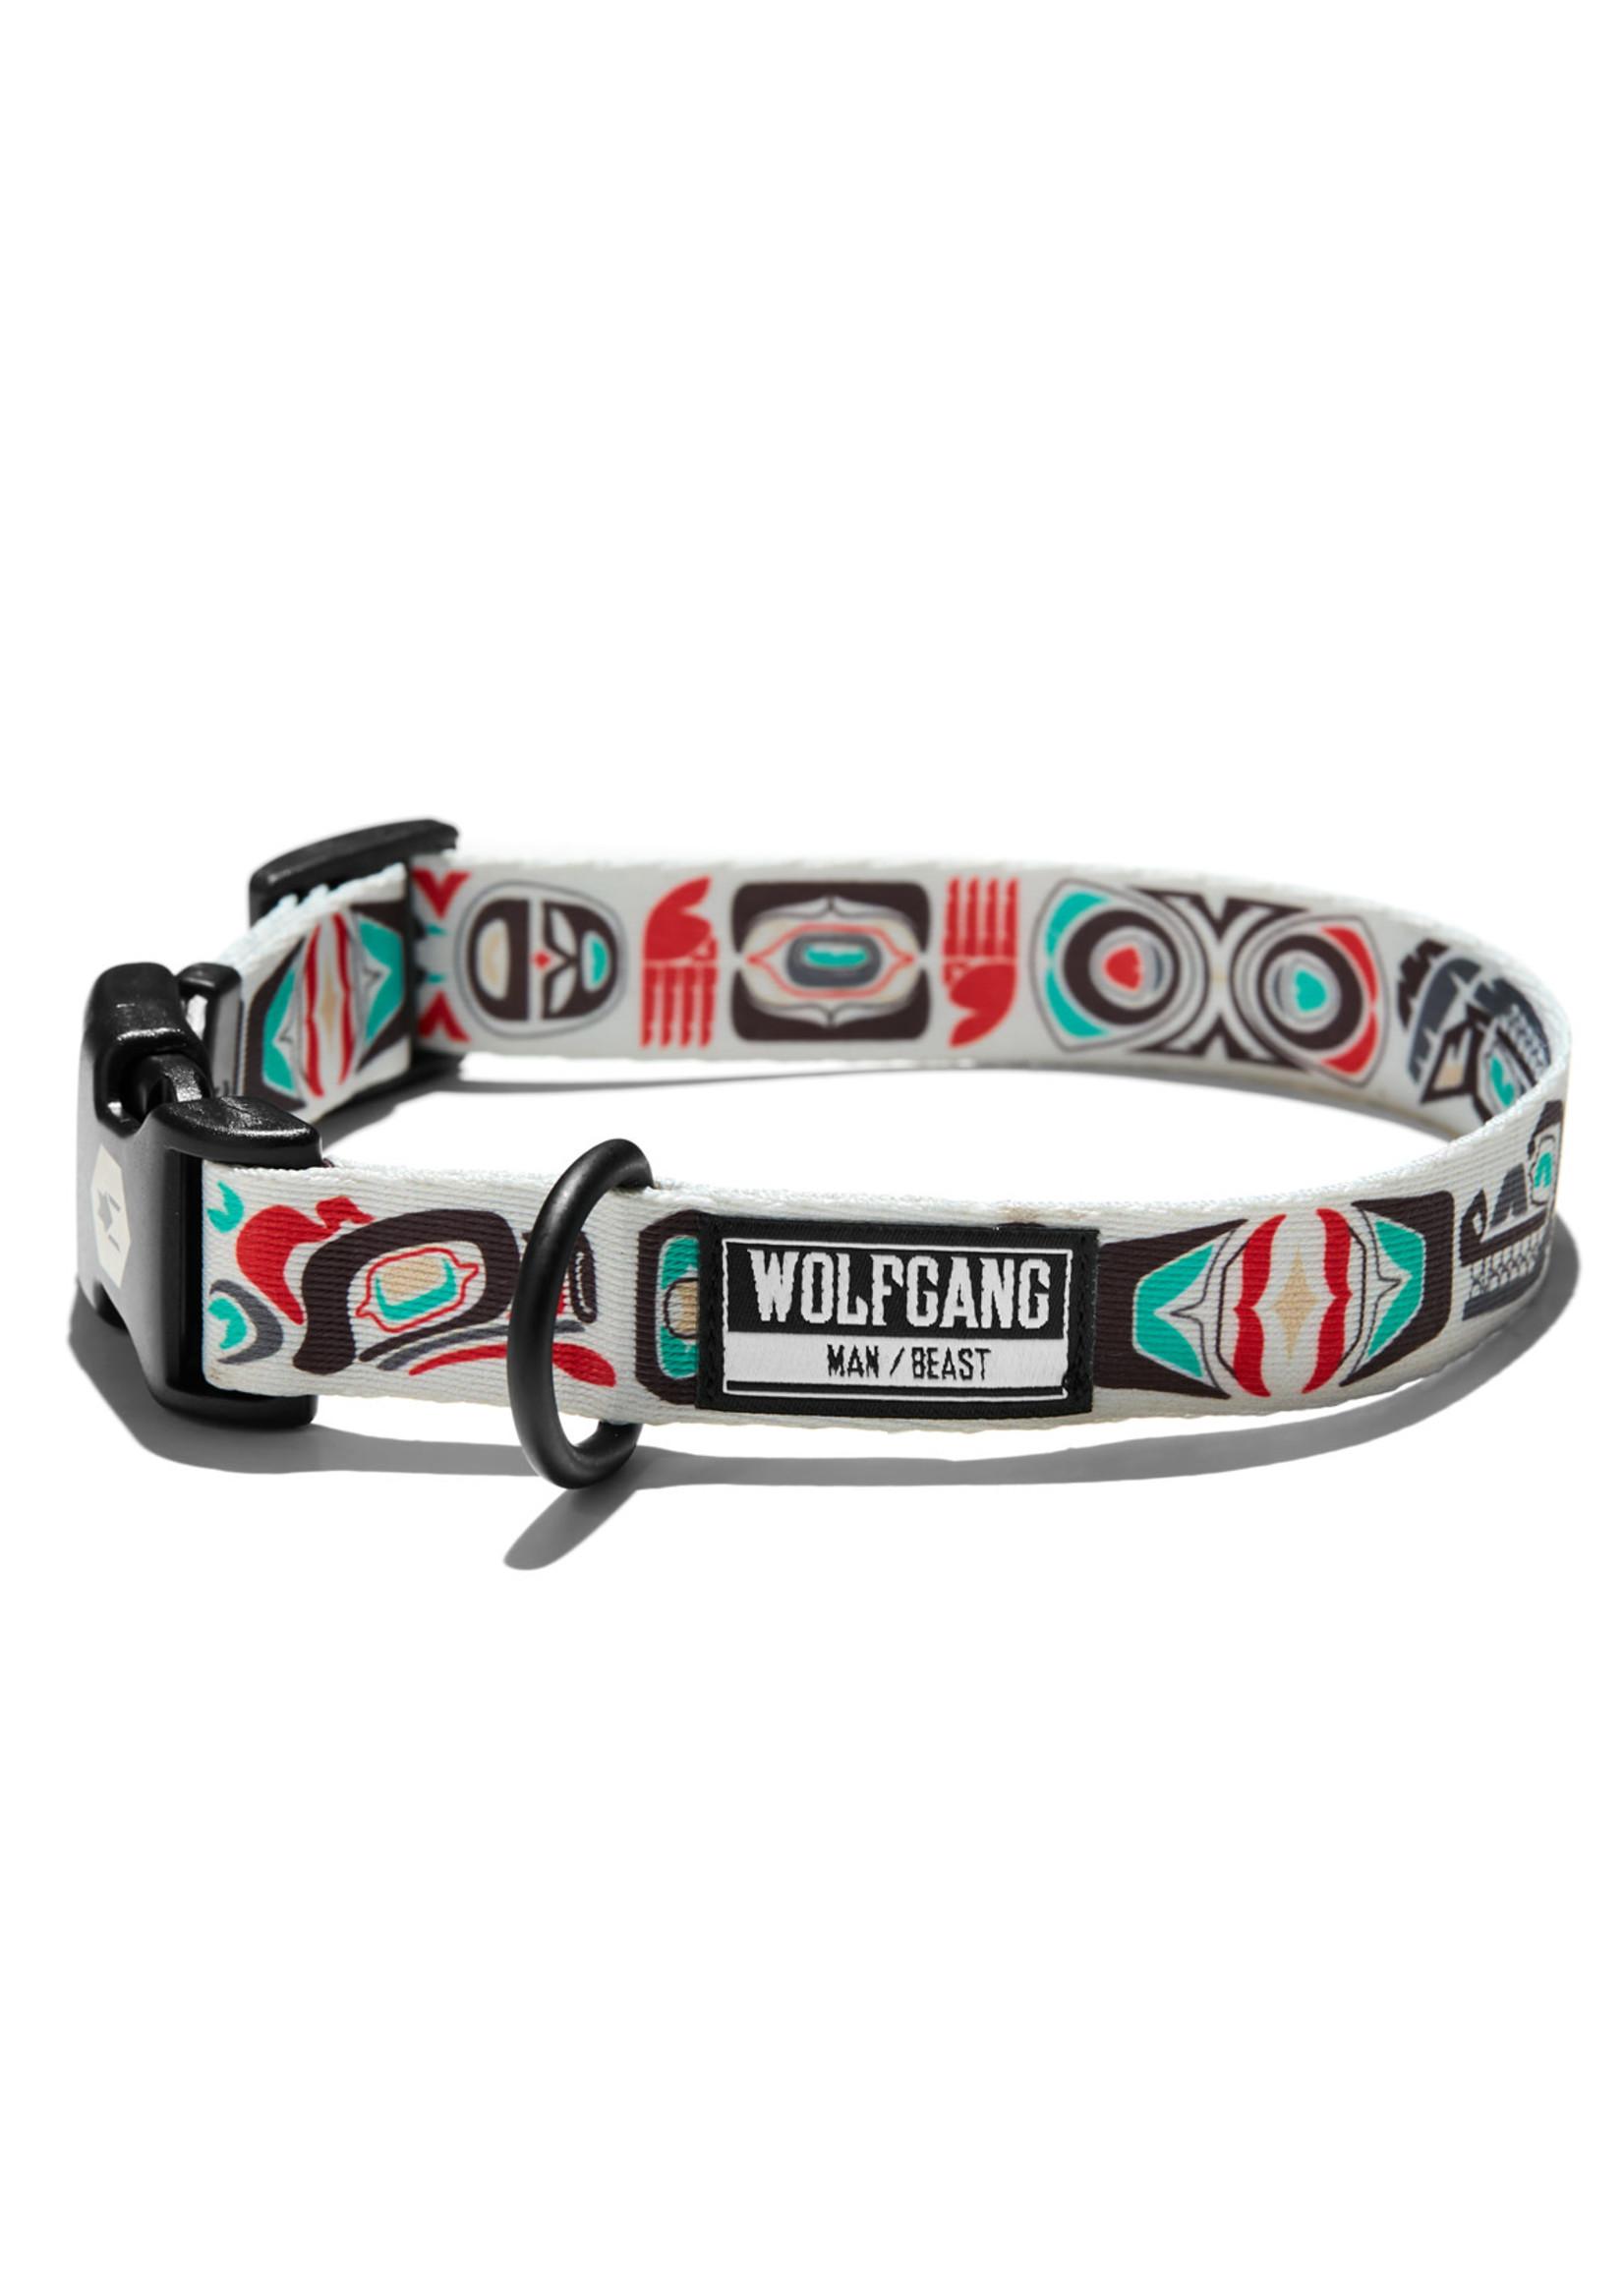 Wolfgang Man & Beast Wolfgang Pacific North Collar L